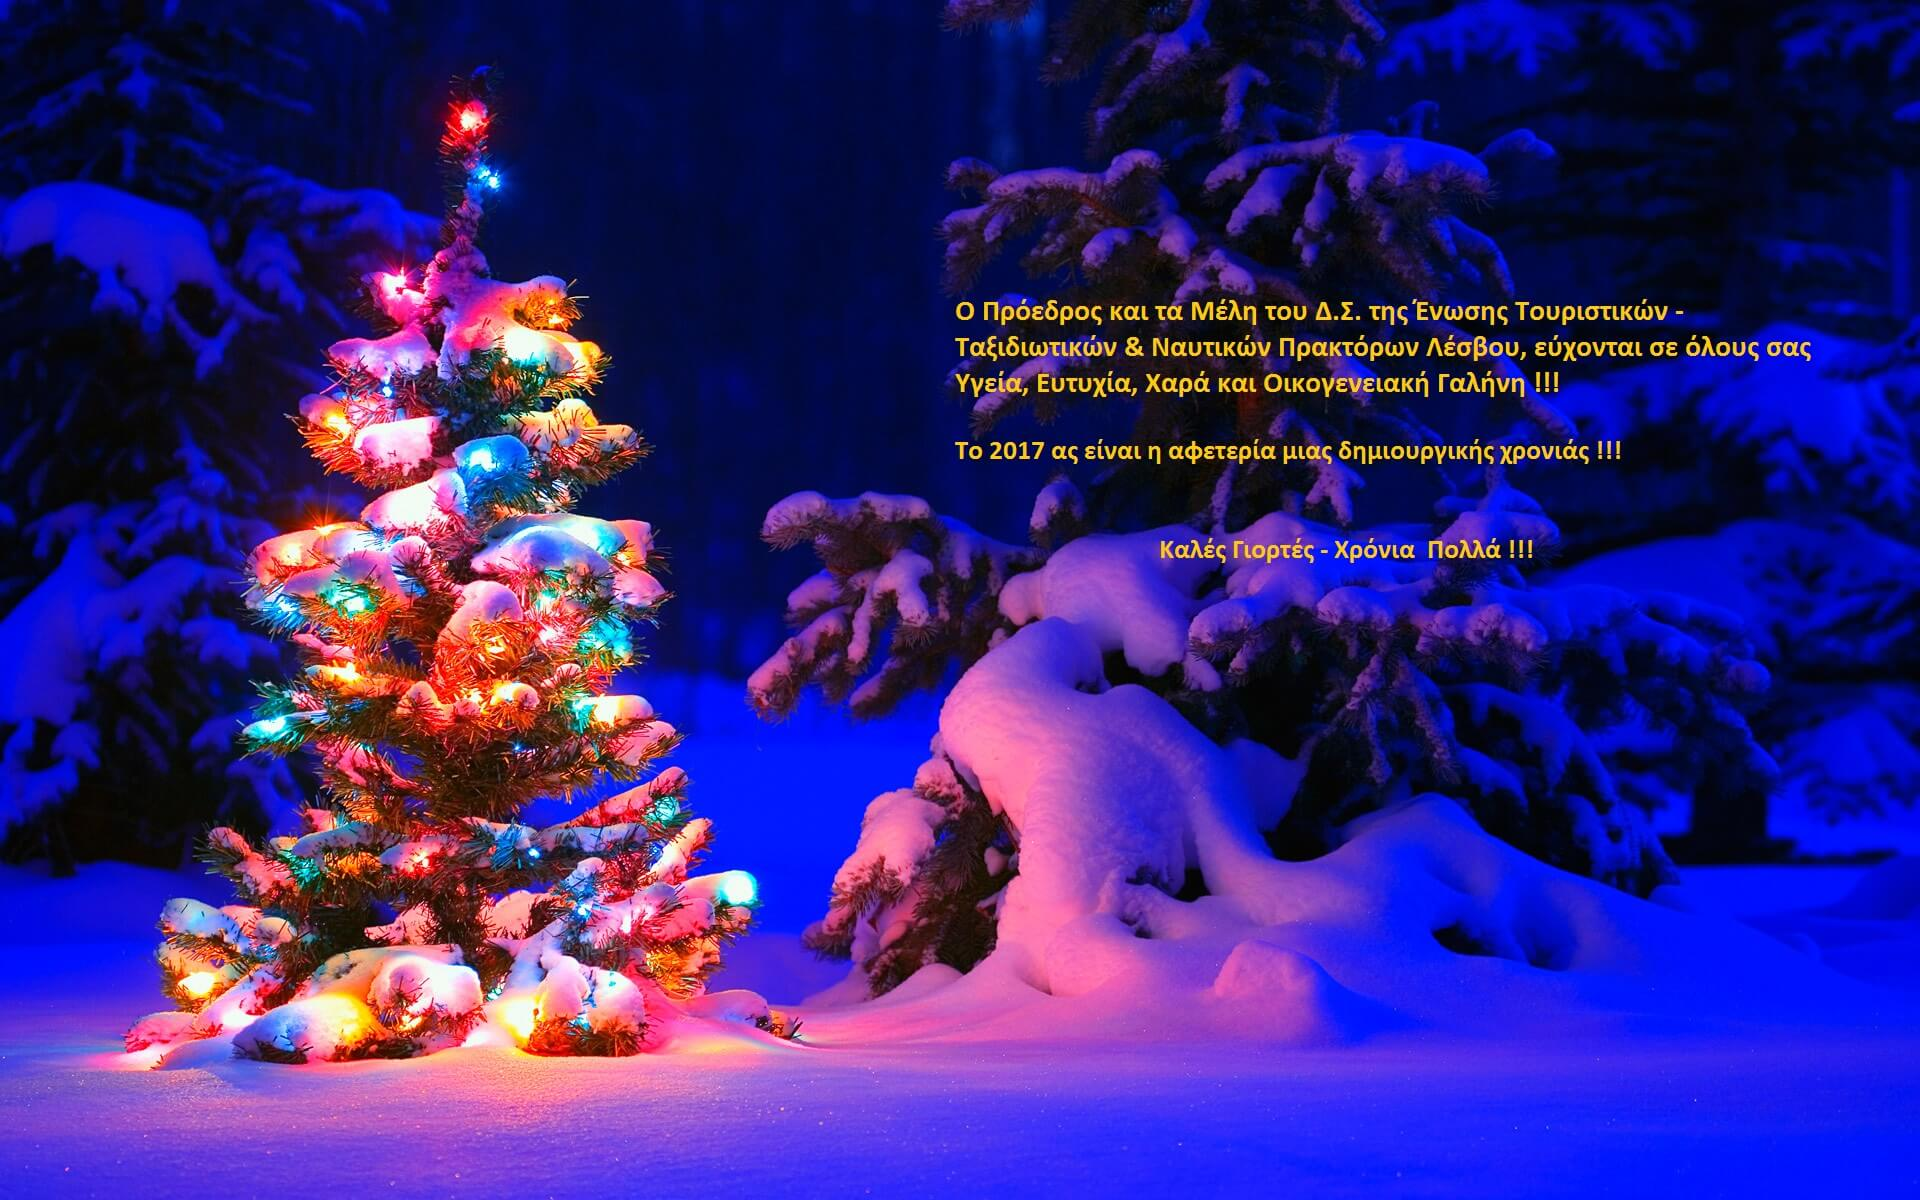 snowy_christmas_tree_lights-wide